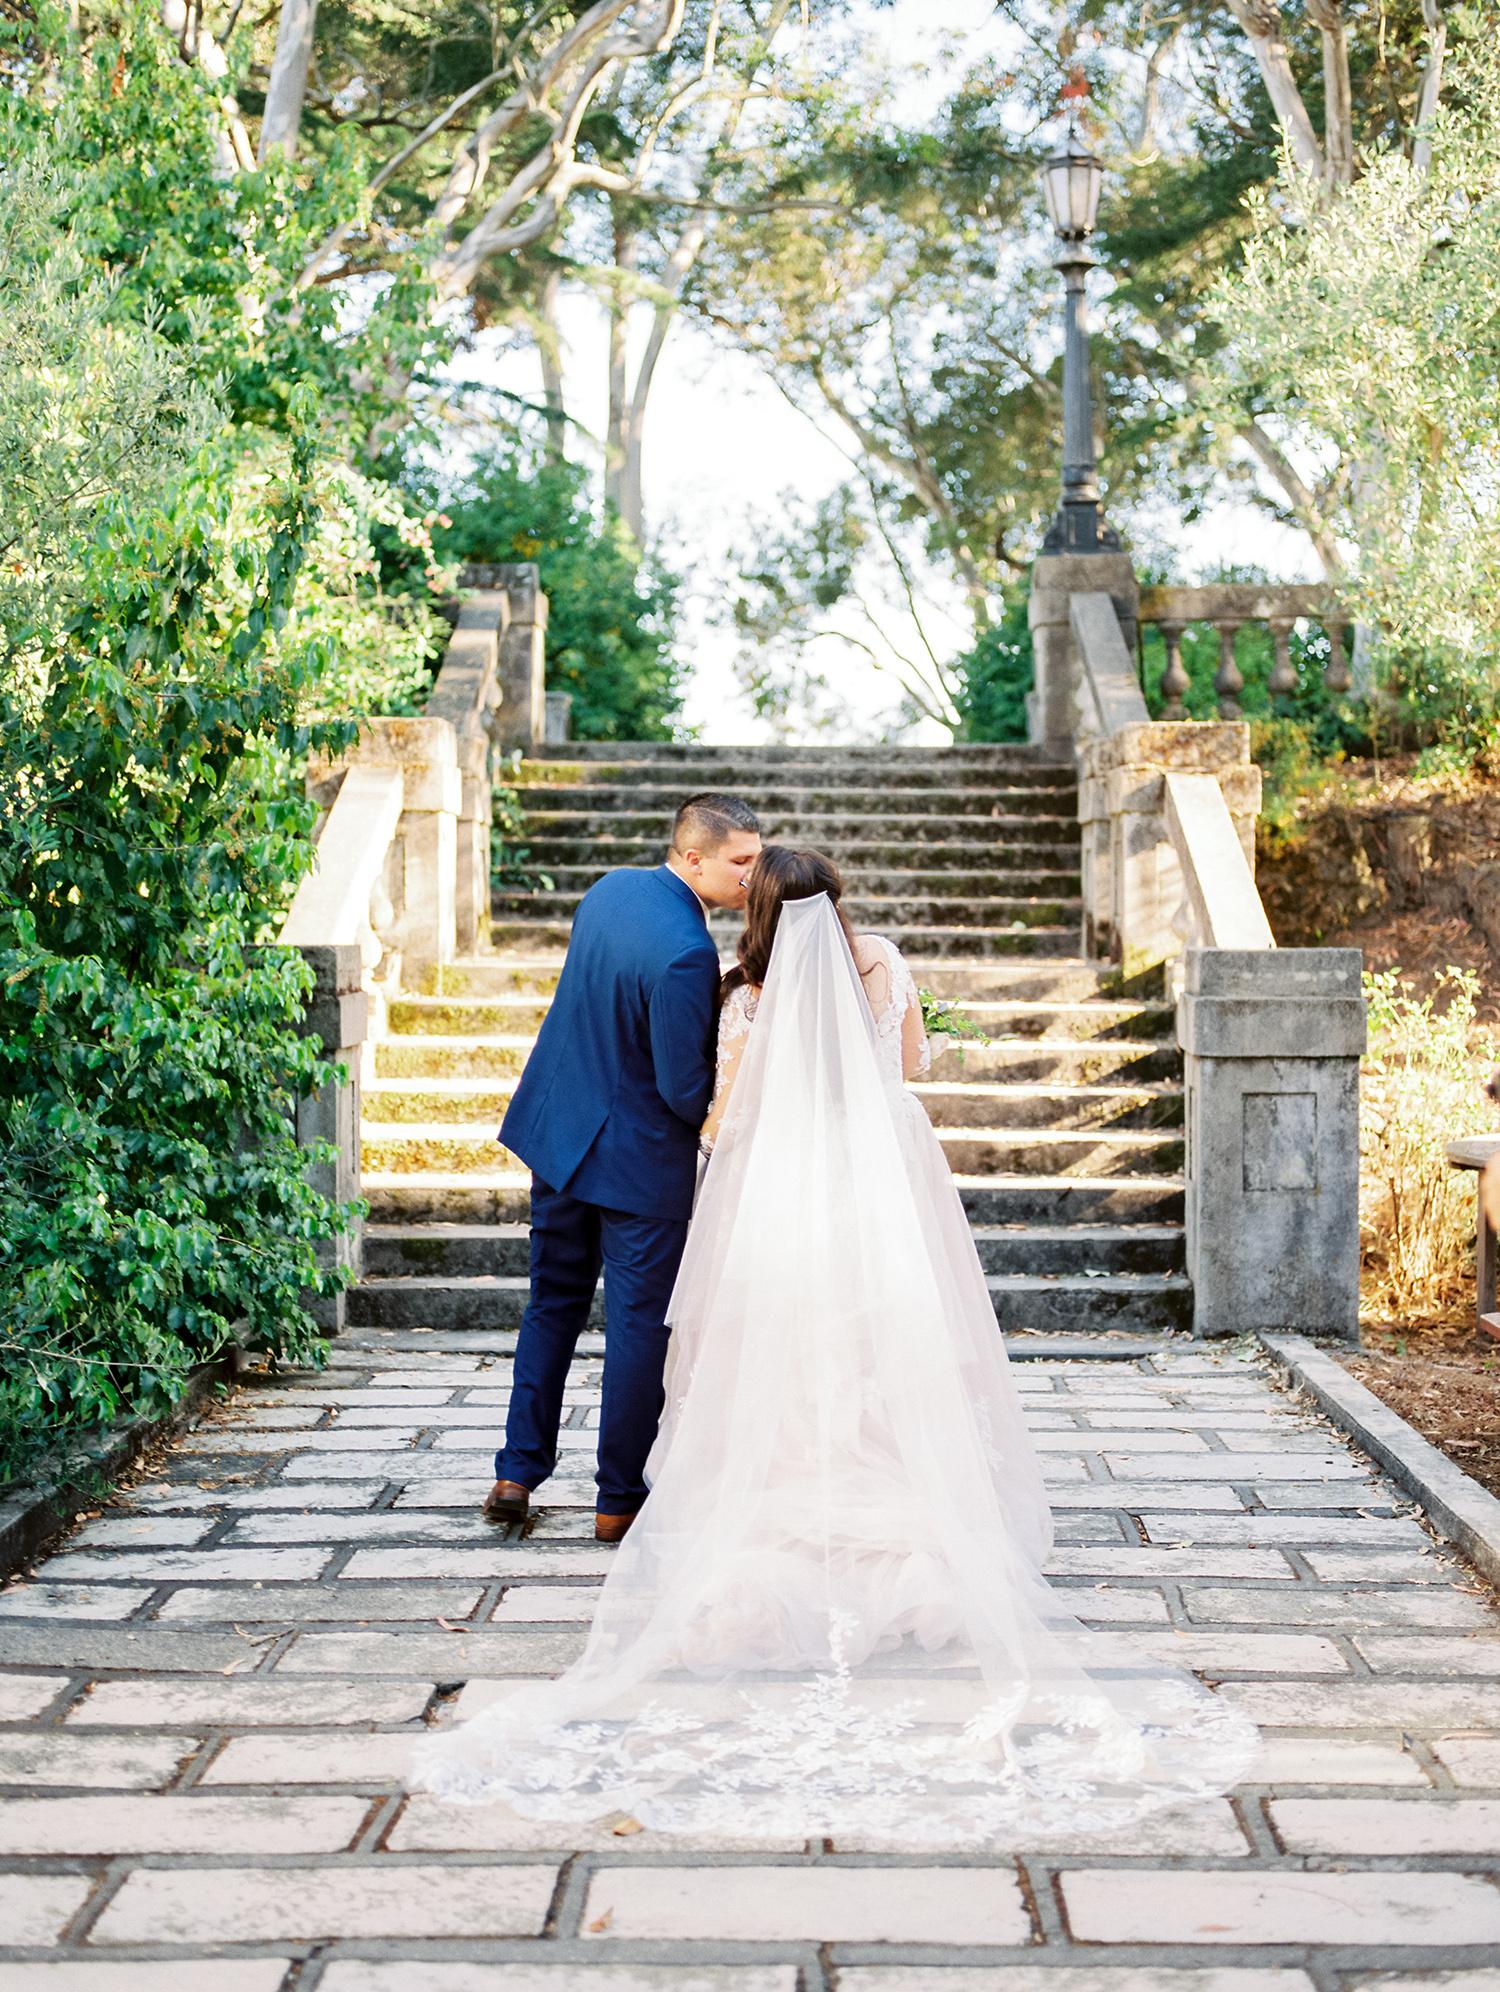 erika evan wedding couple in front of steps